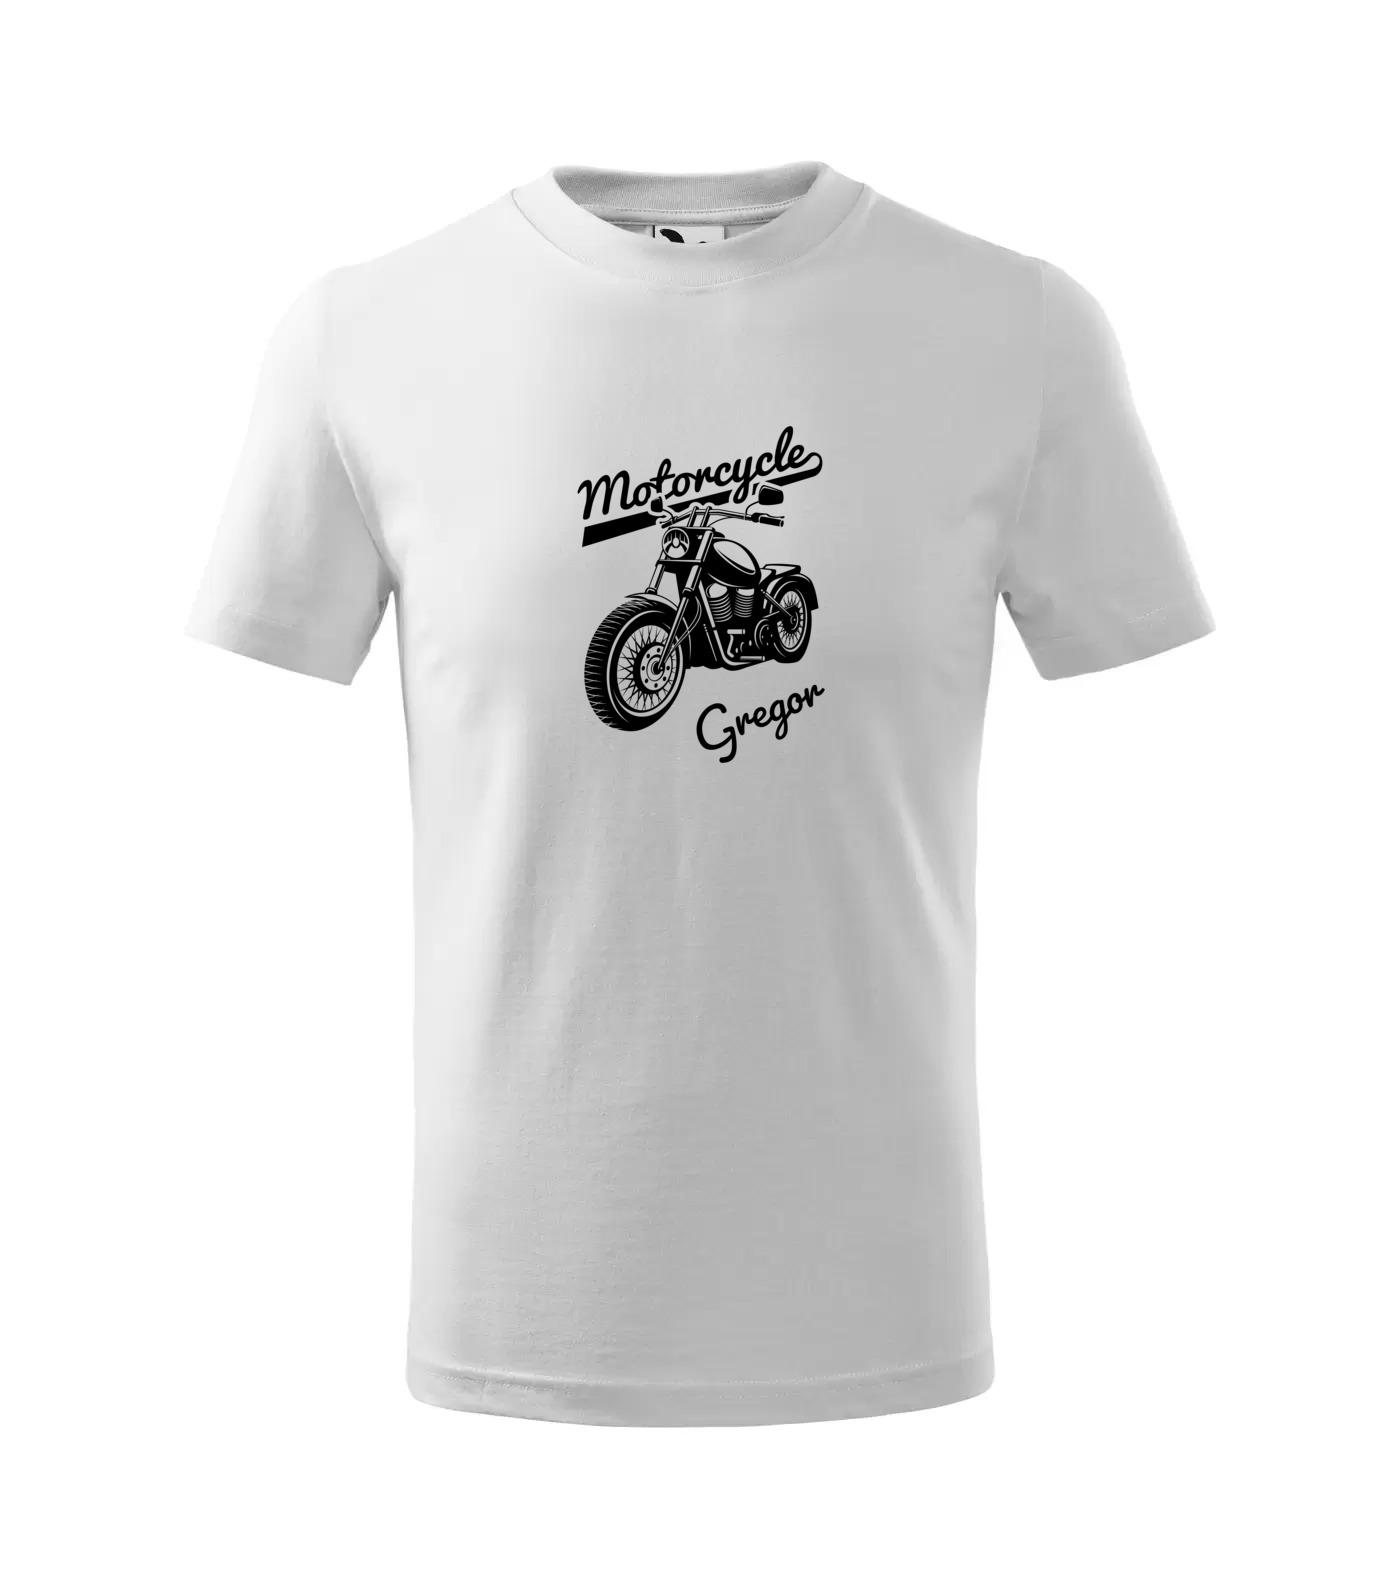 Tričko Motorkář Inverse Gregor